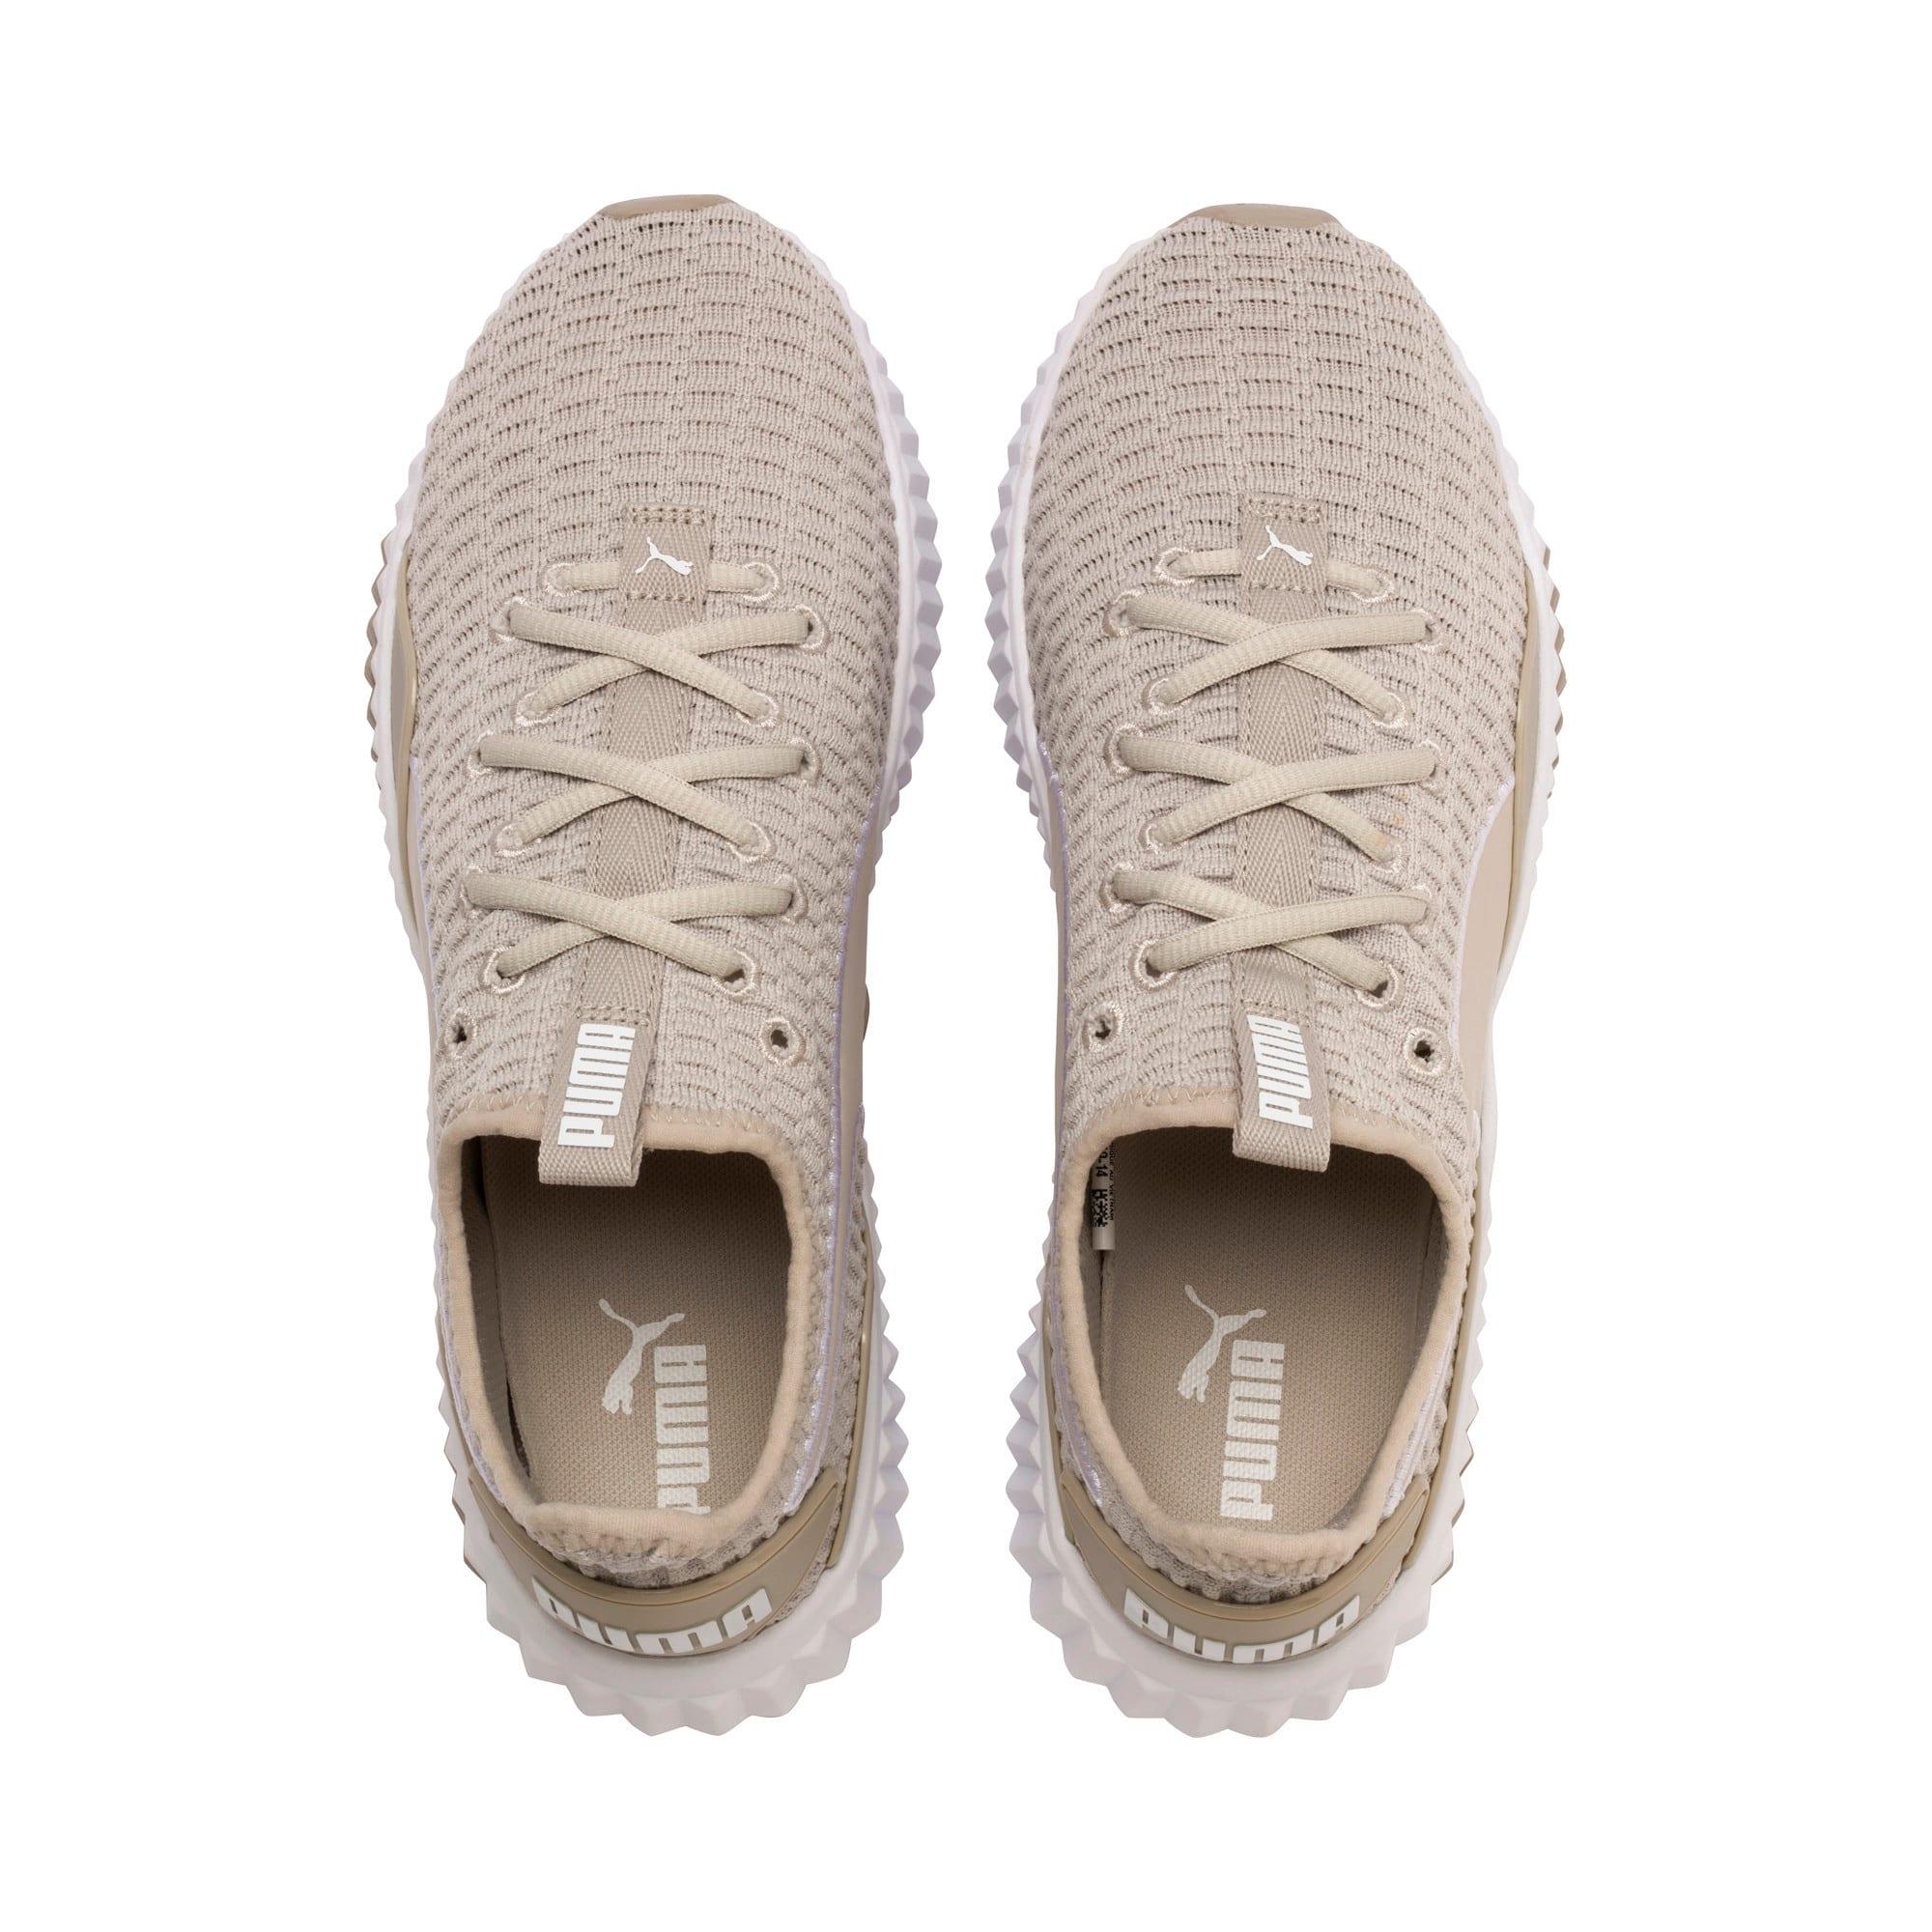 Thumbnail 6 of Defy Women's Training Shoes, Silver Gray-Puma White, medium